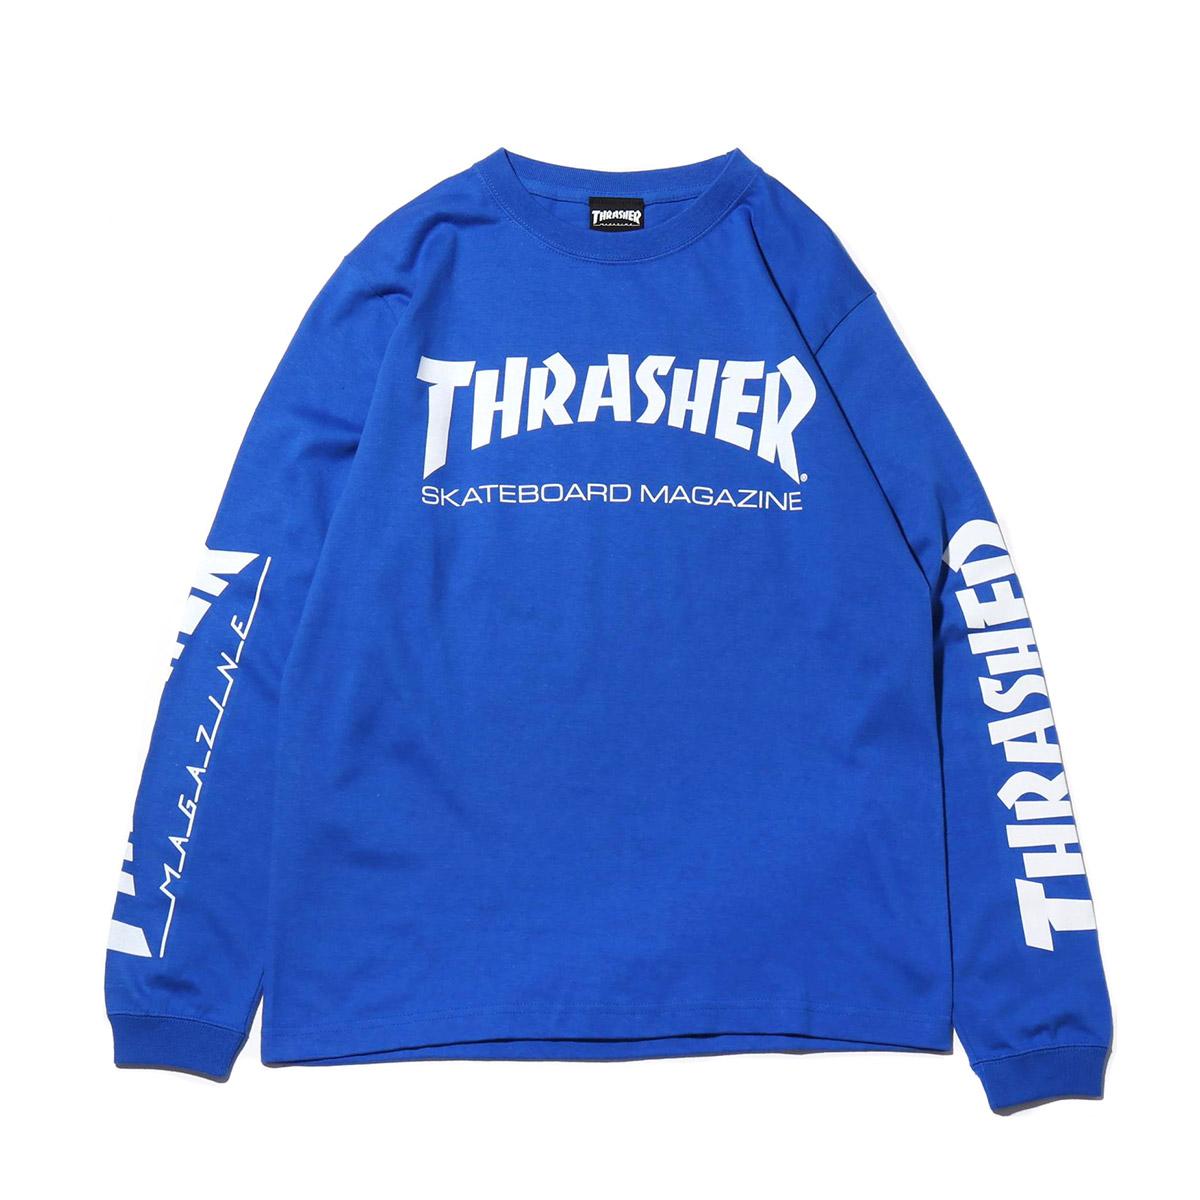 THRASHER MAG SLEEVE L/S TEE(ROYAL/WHITE)(スラッシャー マグスリーブ ロングスリーブ)【メンズ】【長袖Tシャツ】【19SS-I】